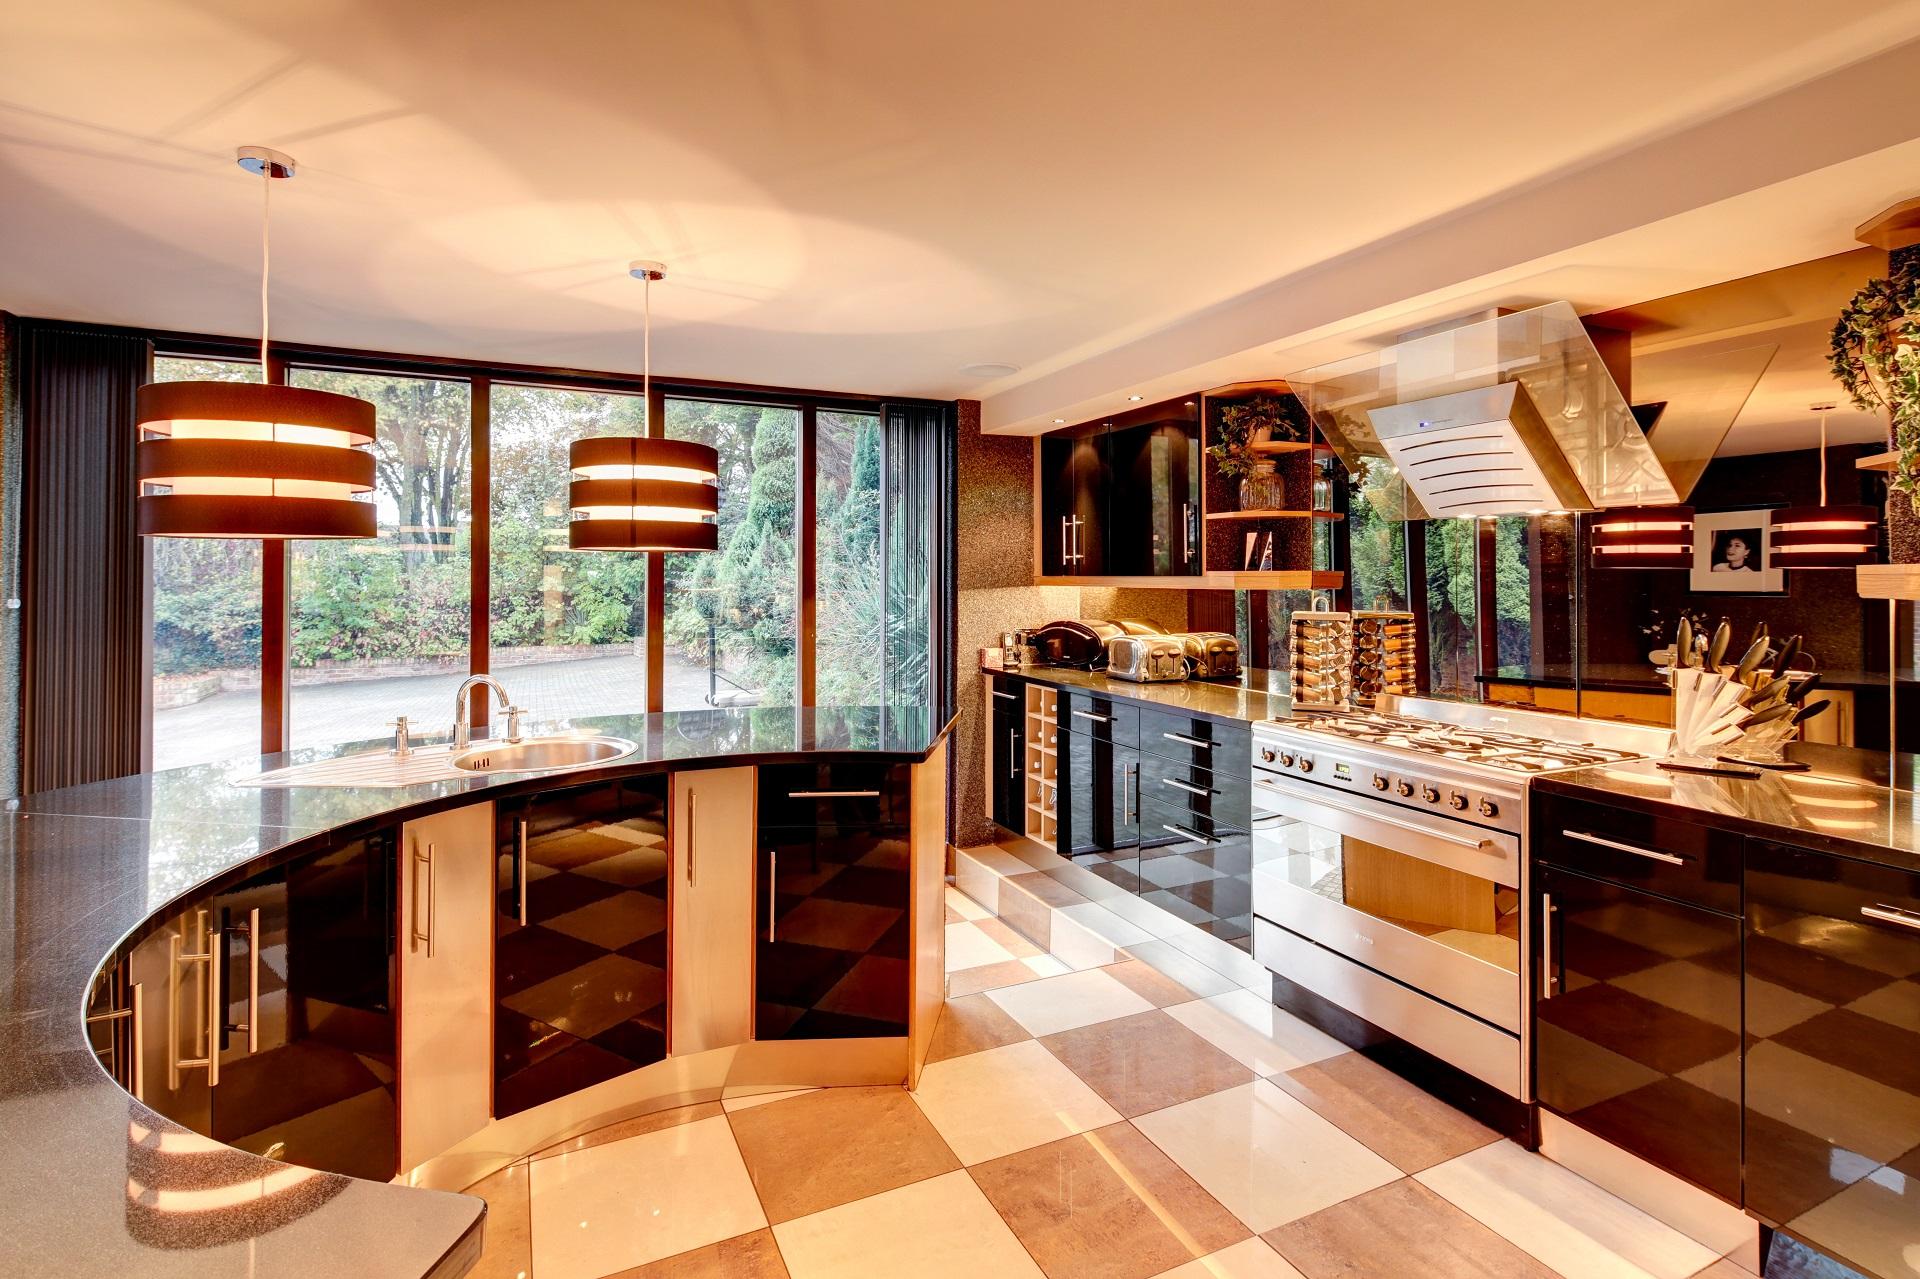 designer kitchen, curved breakfast bar, interior designer in nottingham